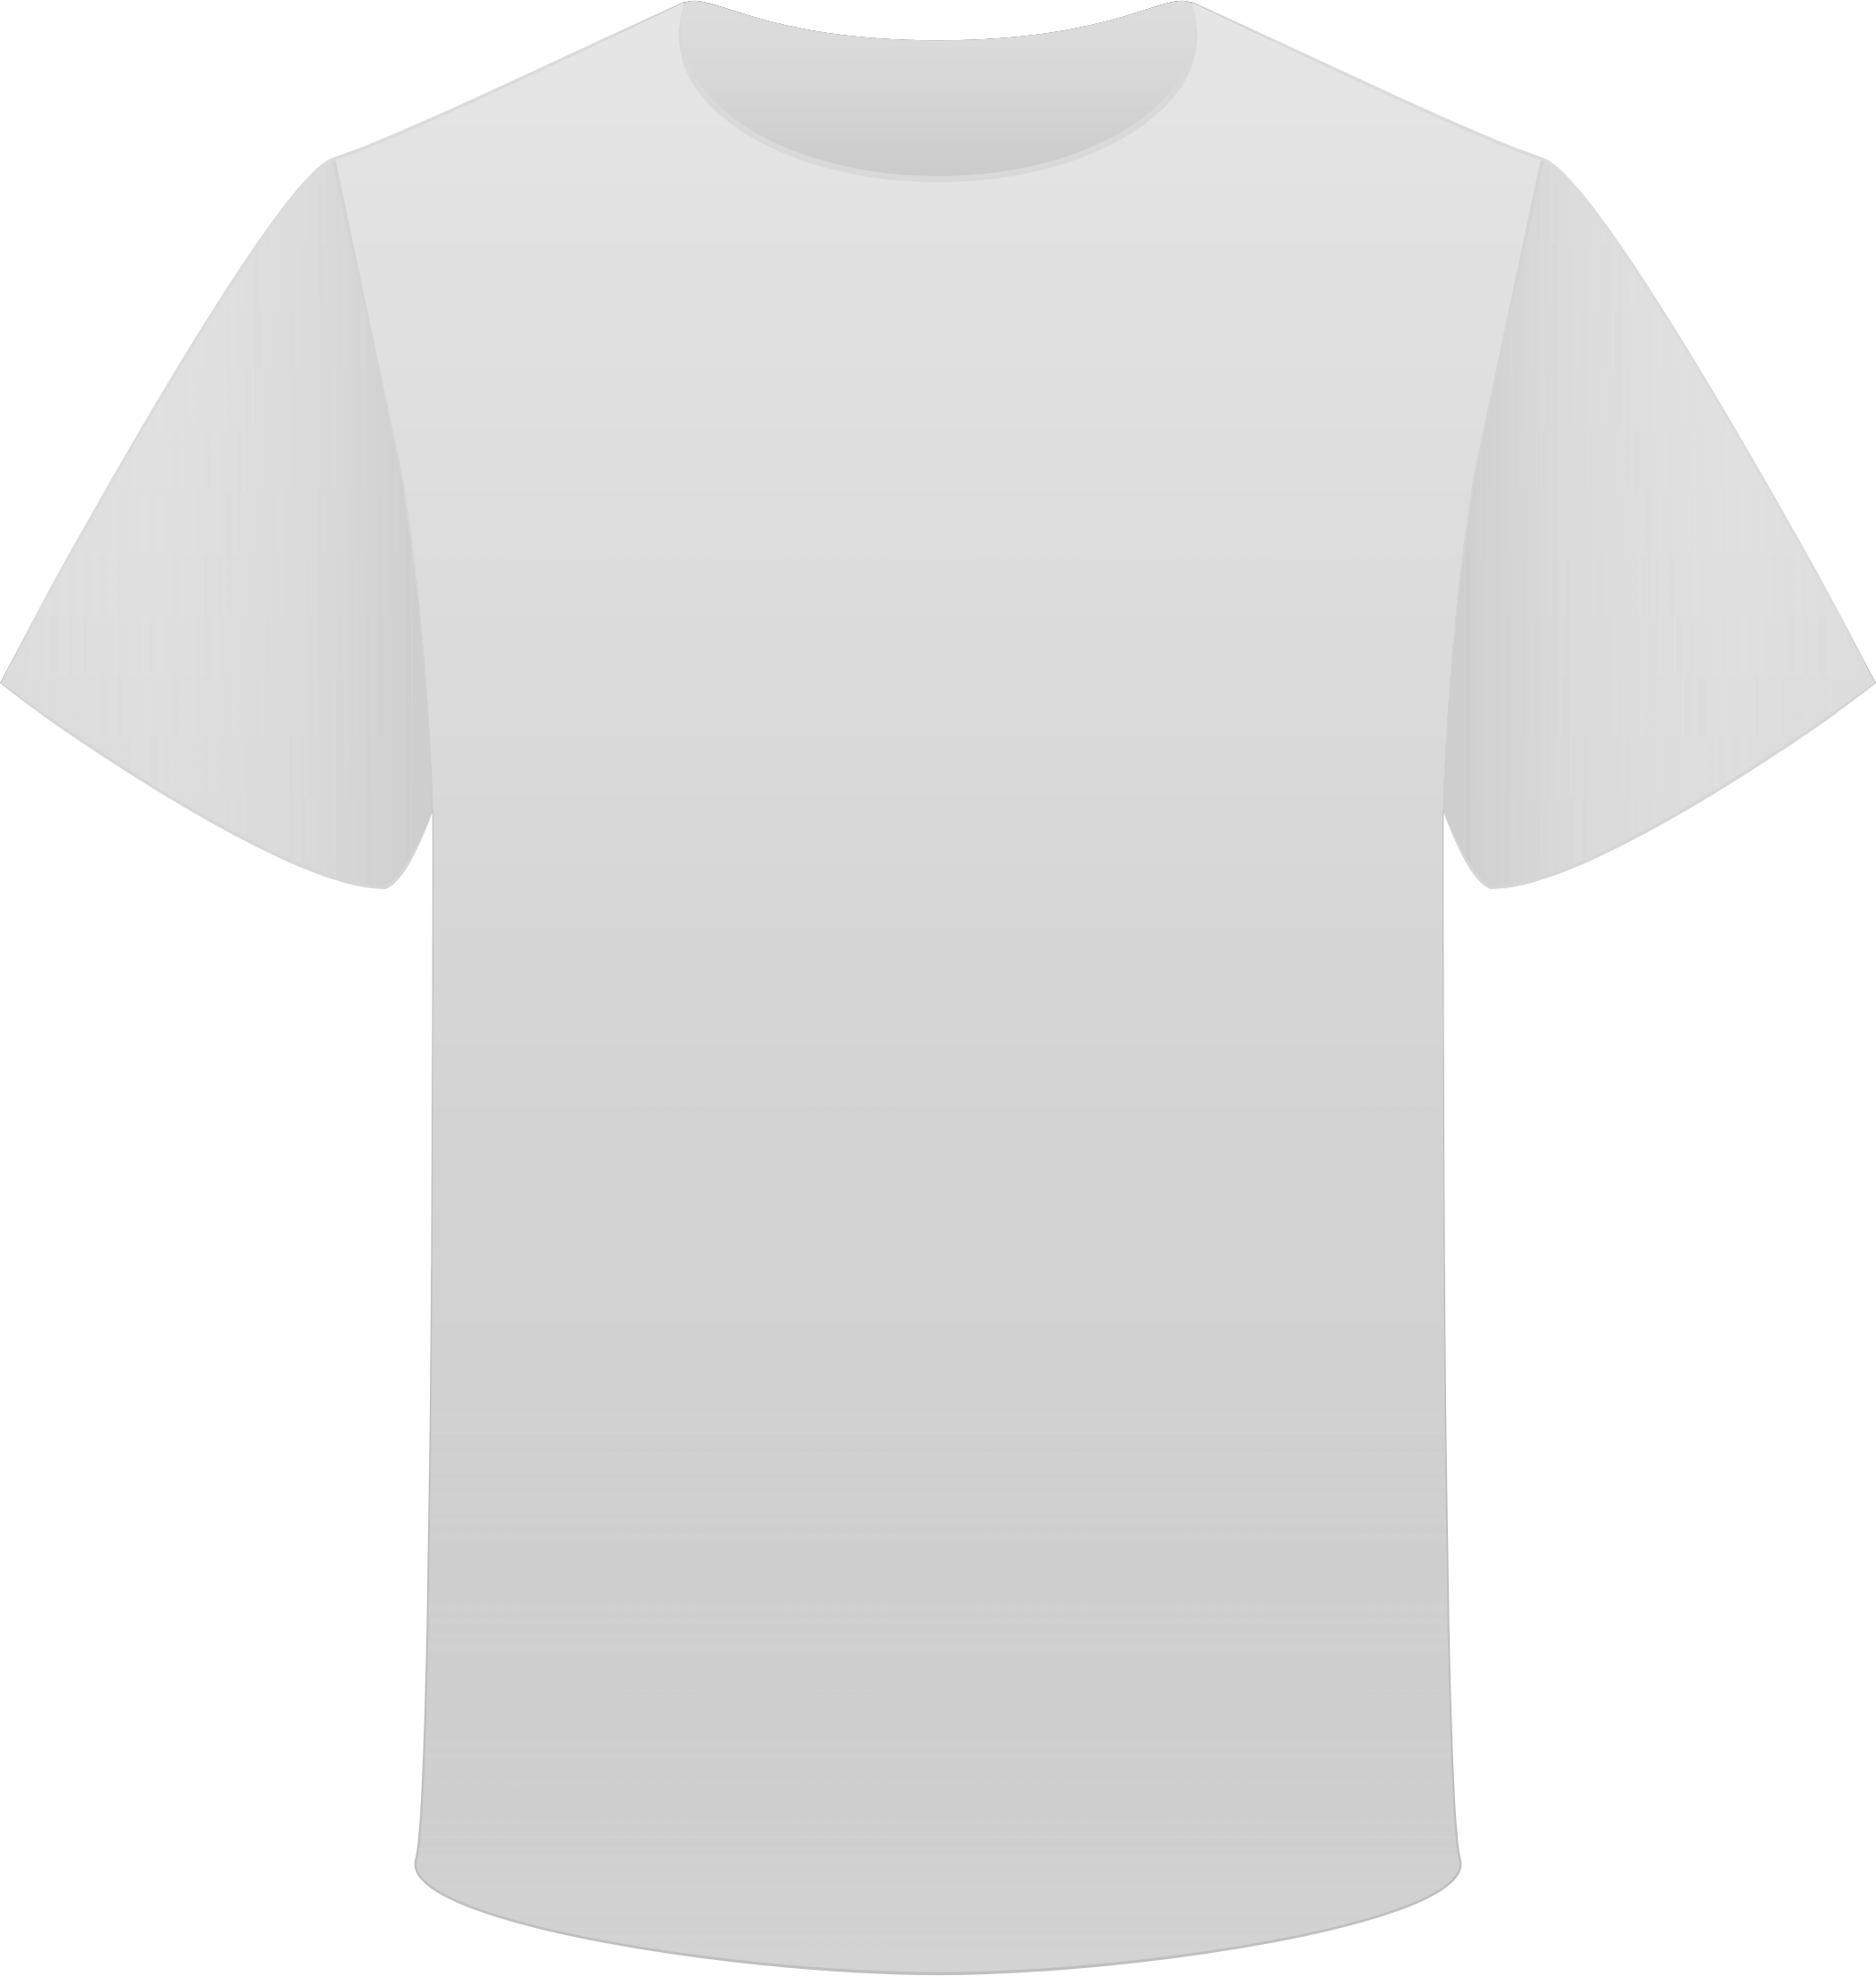 Tshirt Grey Back transparent PNG.